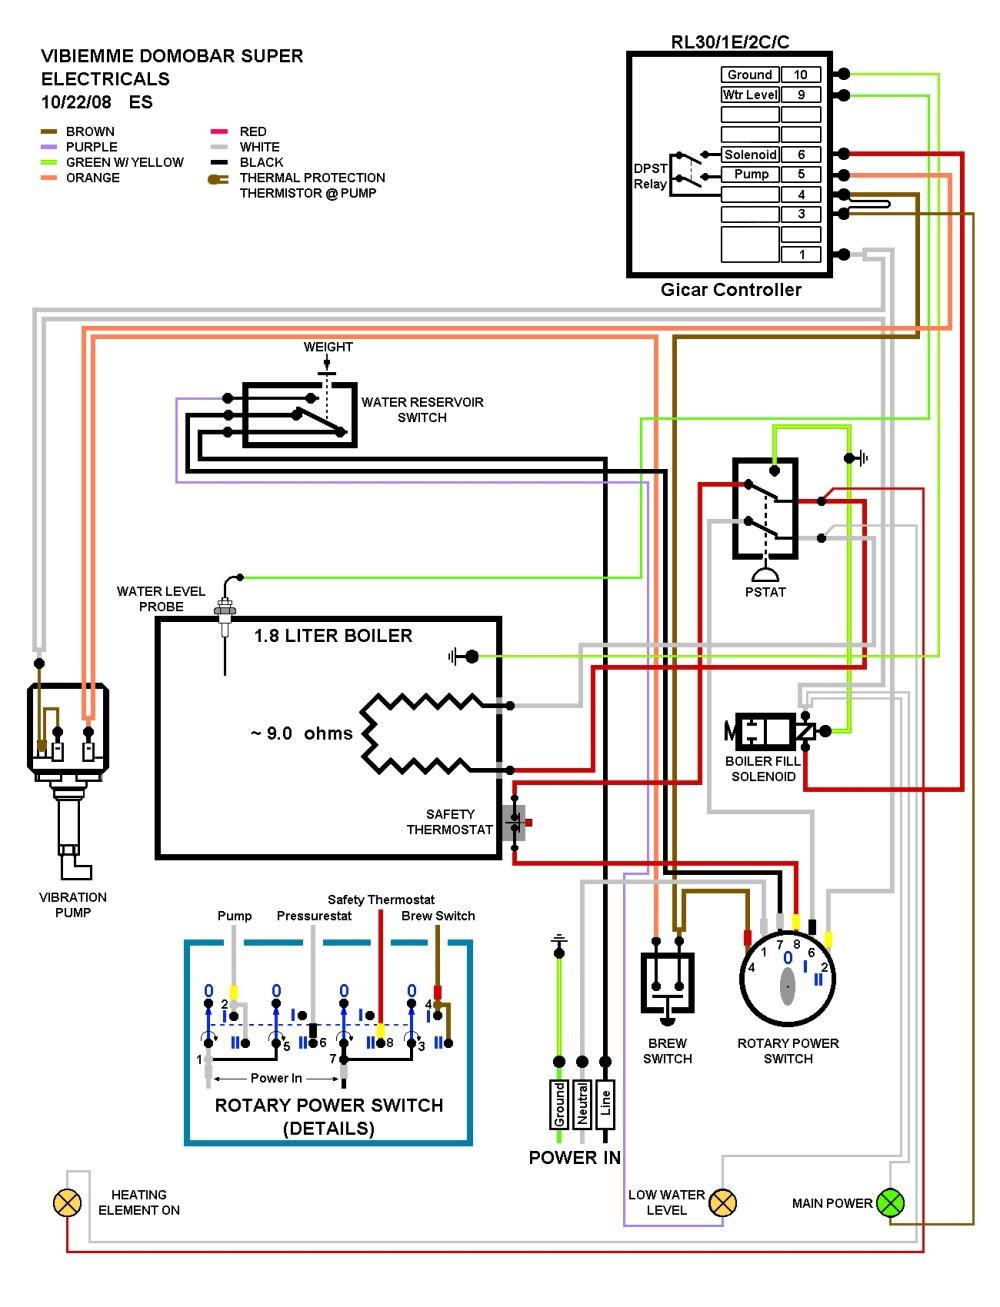 medium resolution of vibiemme domobar super electrical diagram basic coffee machine wiring diagram